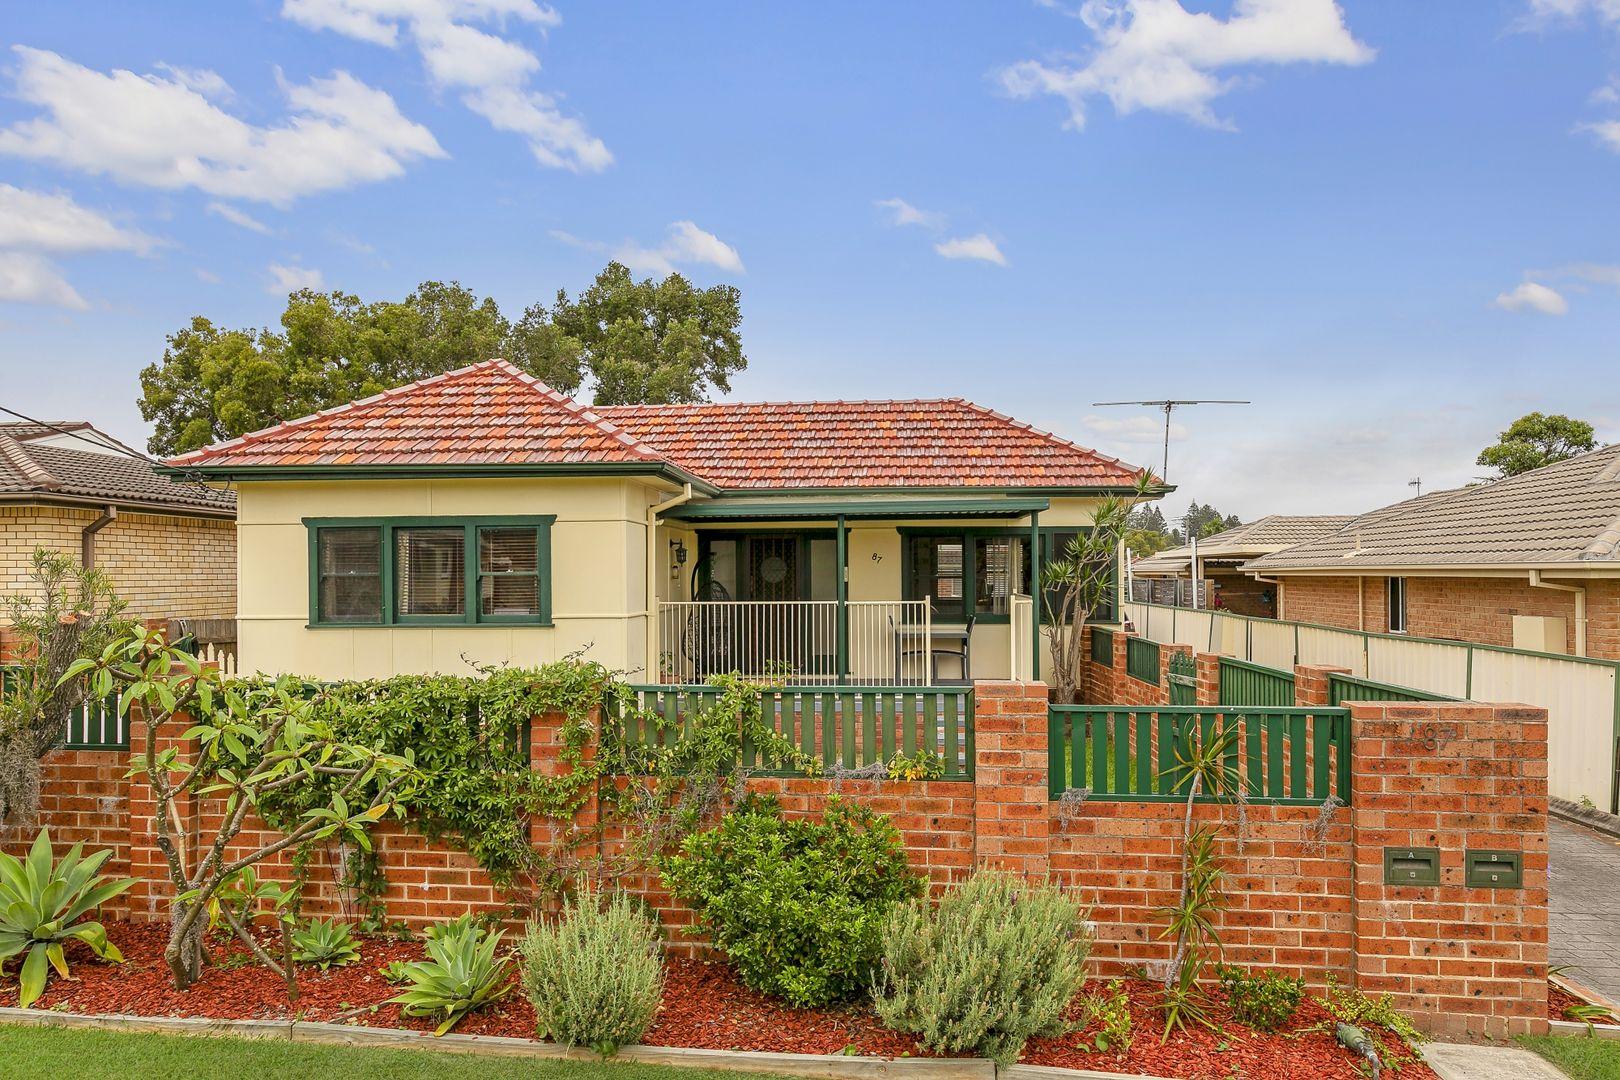 1/87 Swadling Street, Long Jetty NSW 2261, Image 0